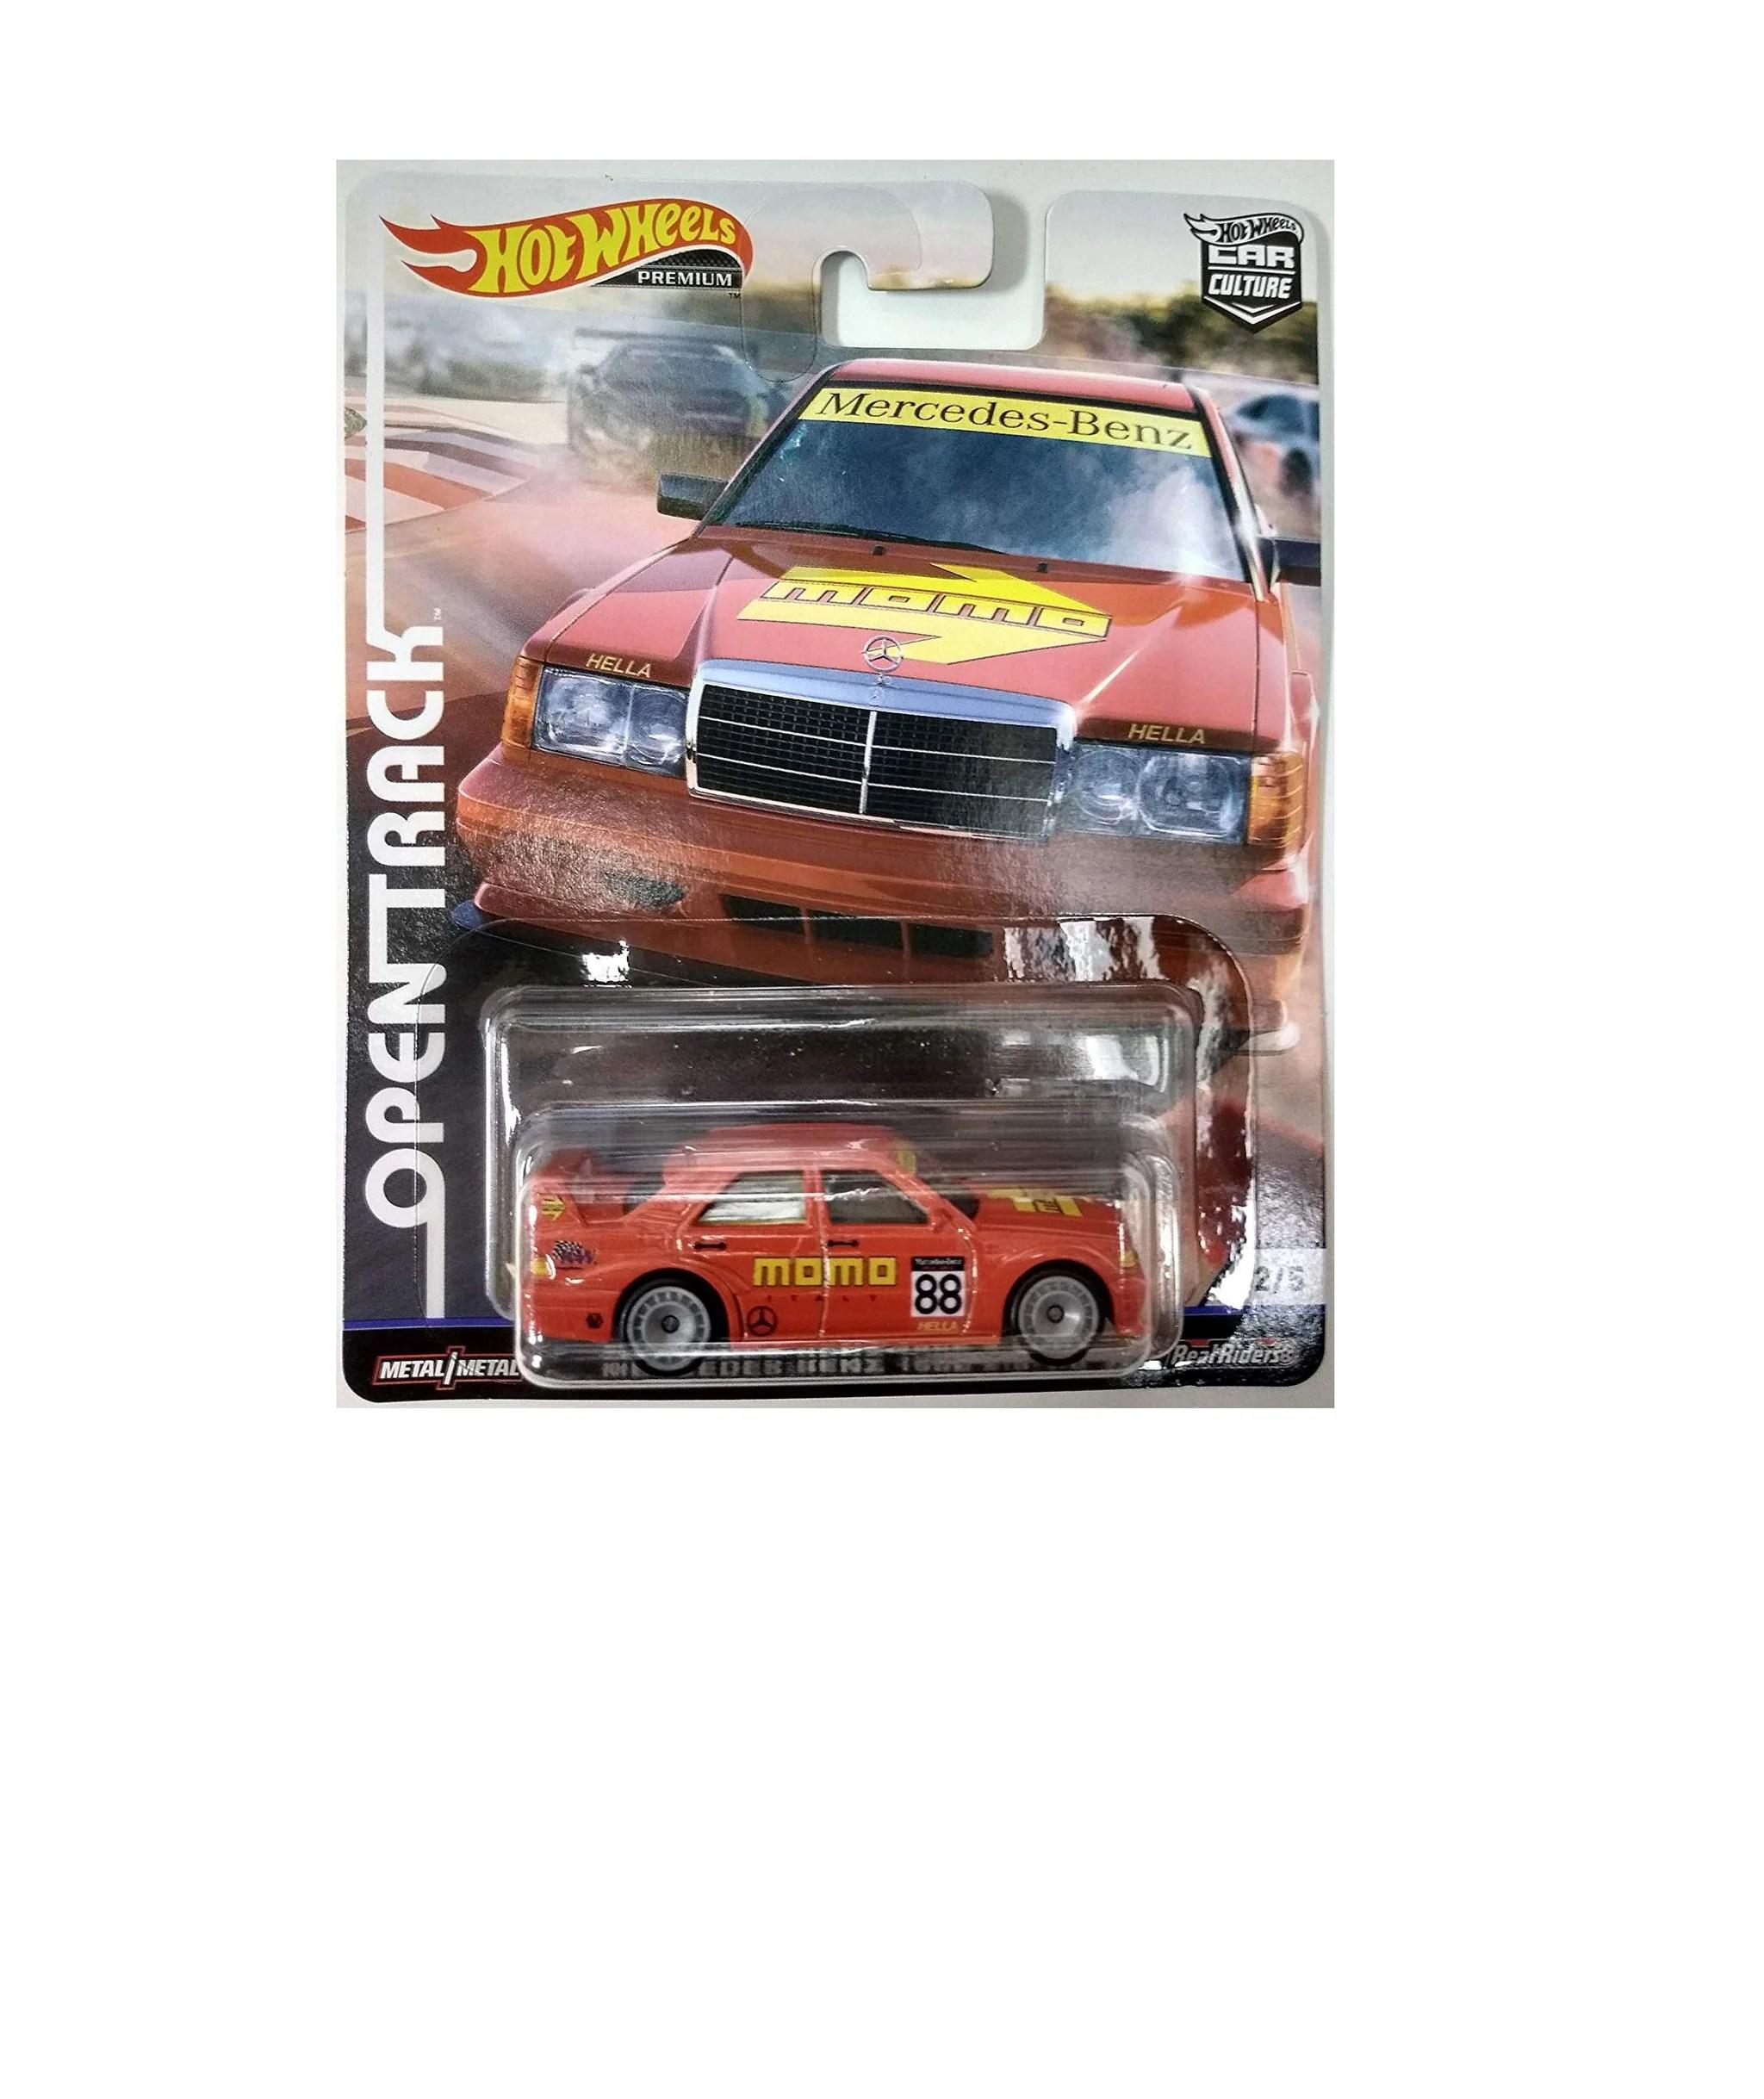 small resolution of mercedes benz 190e car culture premium open track 2 5 hot wheels fpy86 956h